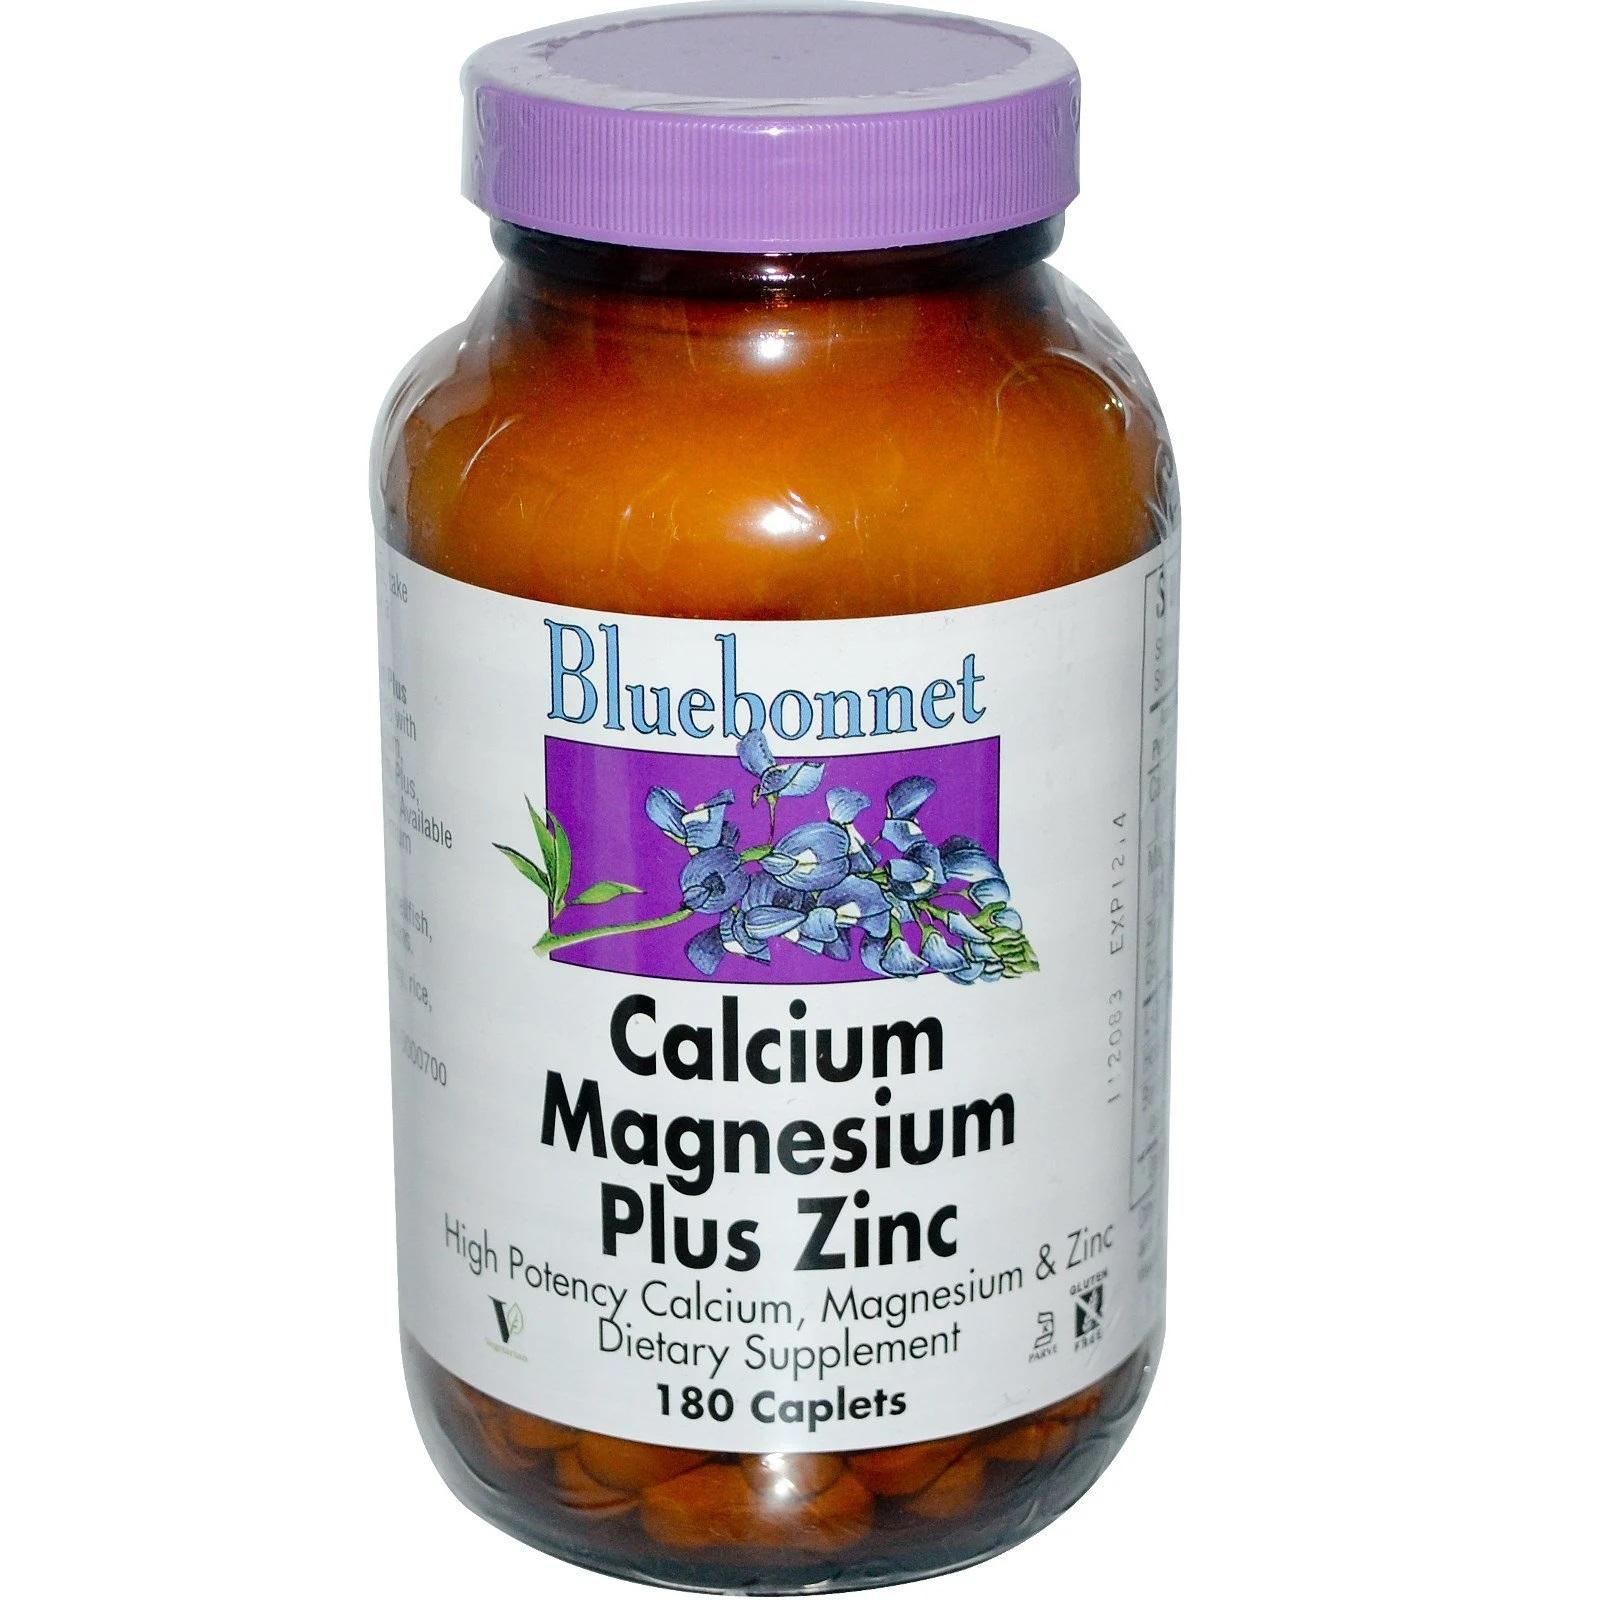 Image of Calcium Magnesium Plus Zinc (180 caplet) - Bluebonnet Nutrition